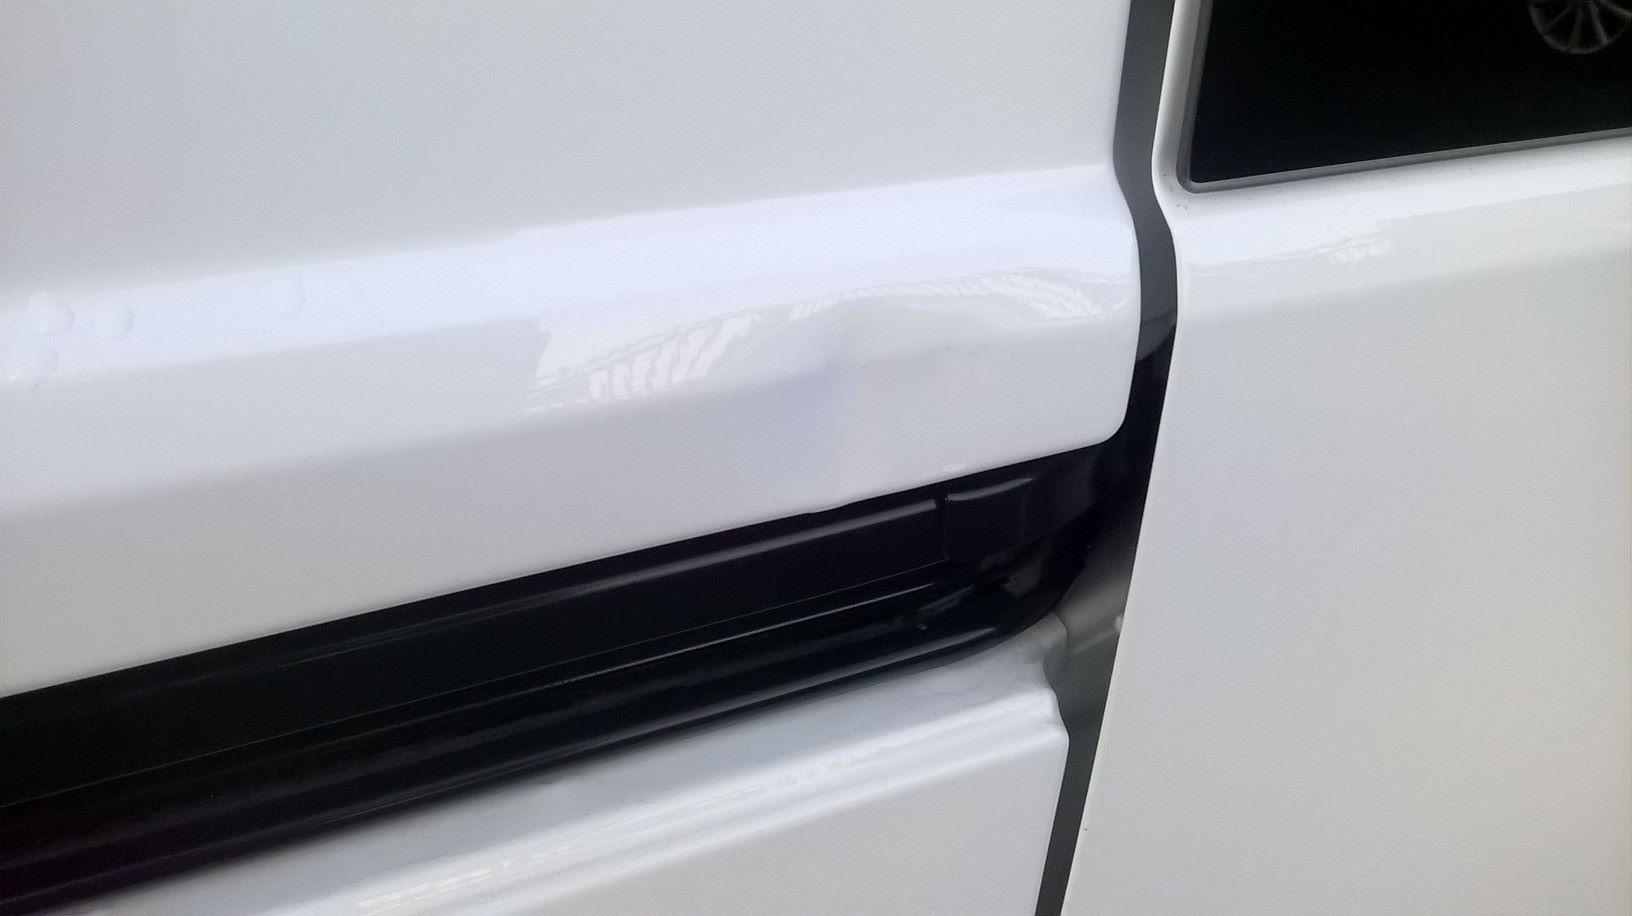 2017 Vauxhall Vivaro 2900 1.6CDTI 120Ps H1 D/CAB EURO 6 (DY67DTV) Image 25